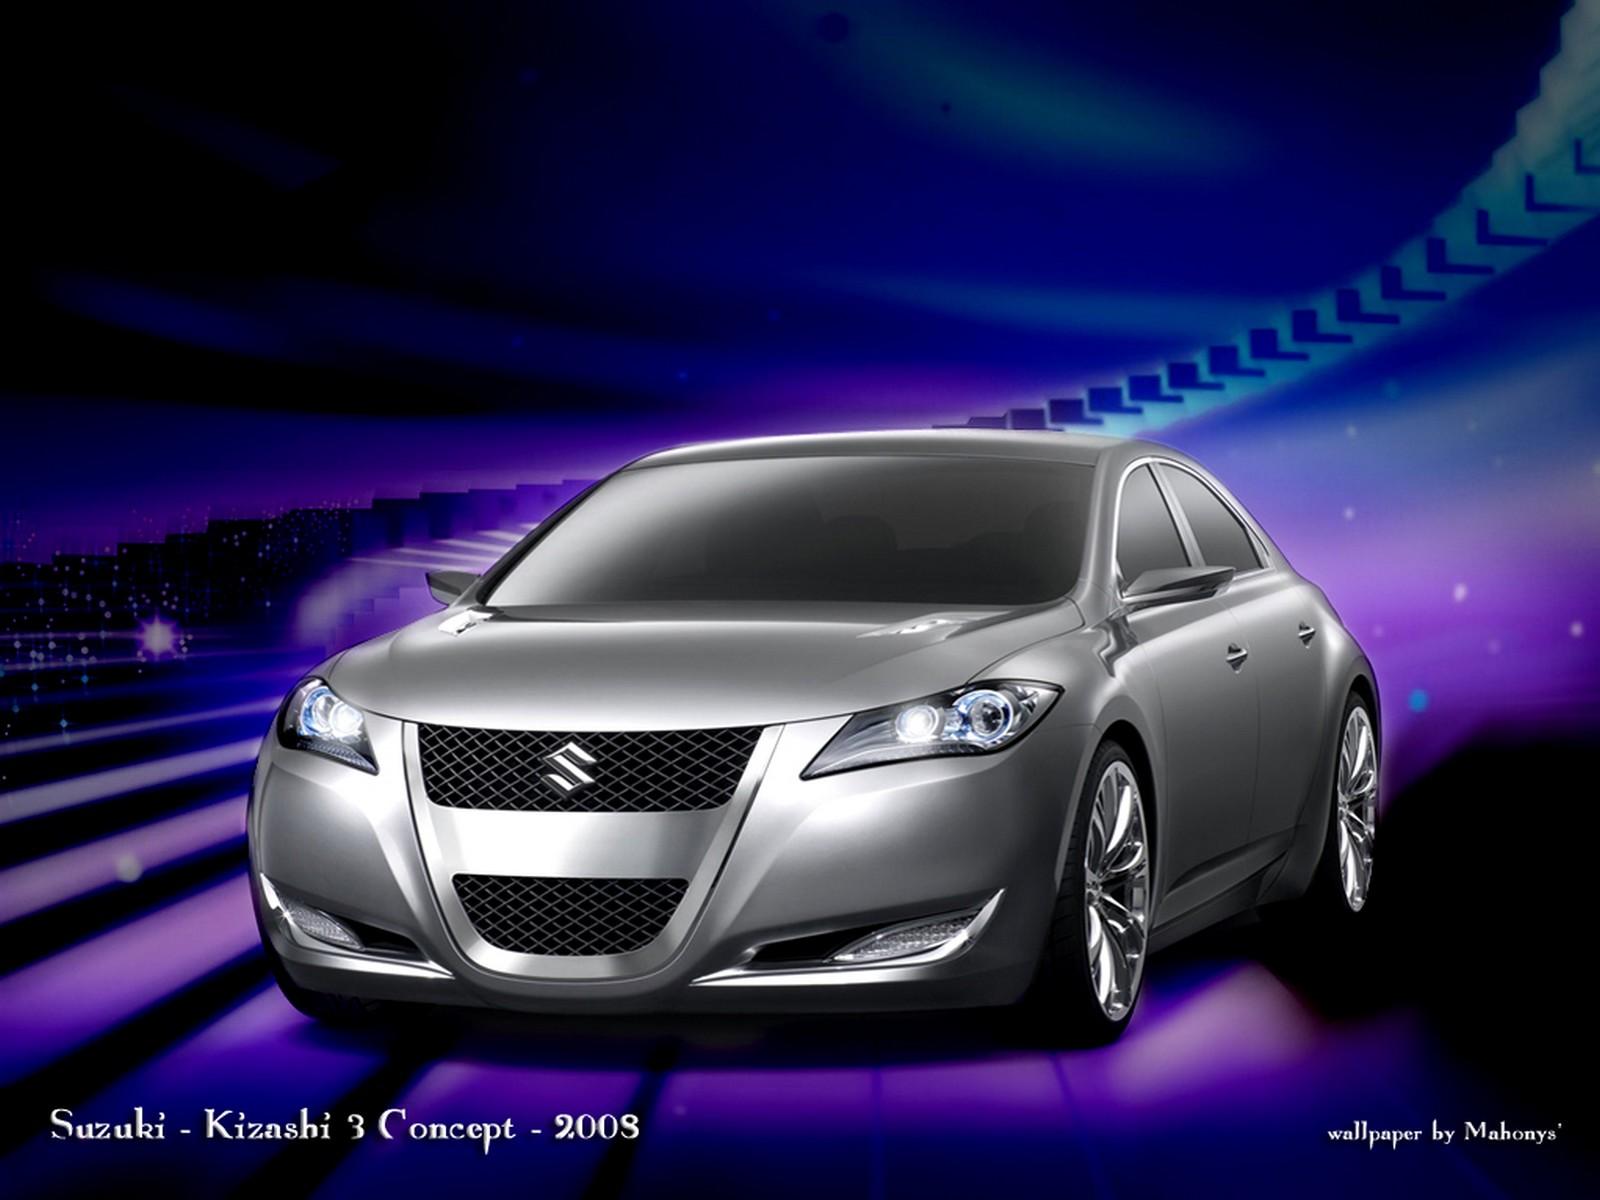 Bakgrunnsbilder til skrivebordet Suzuki - Cars automobil bil Biler